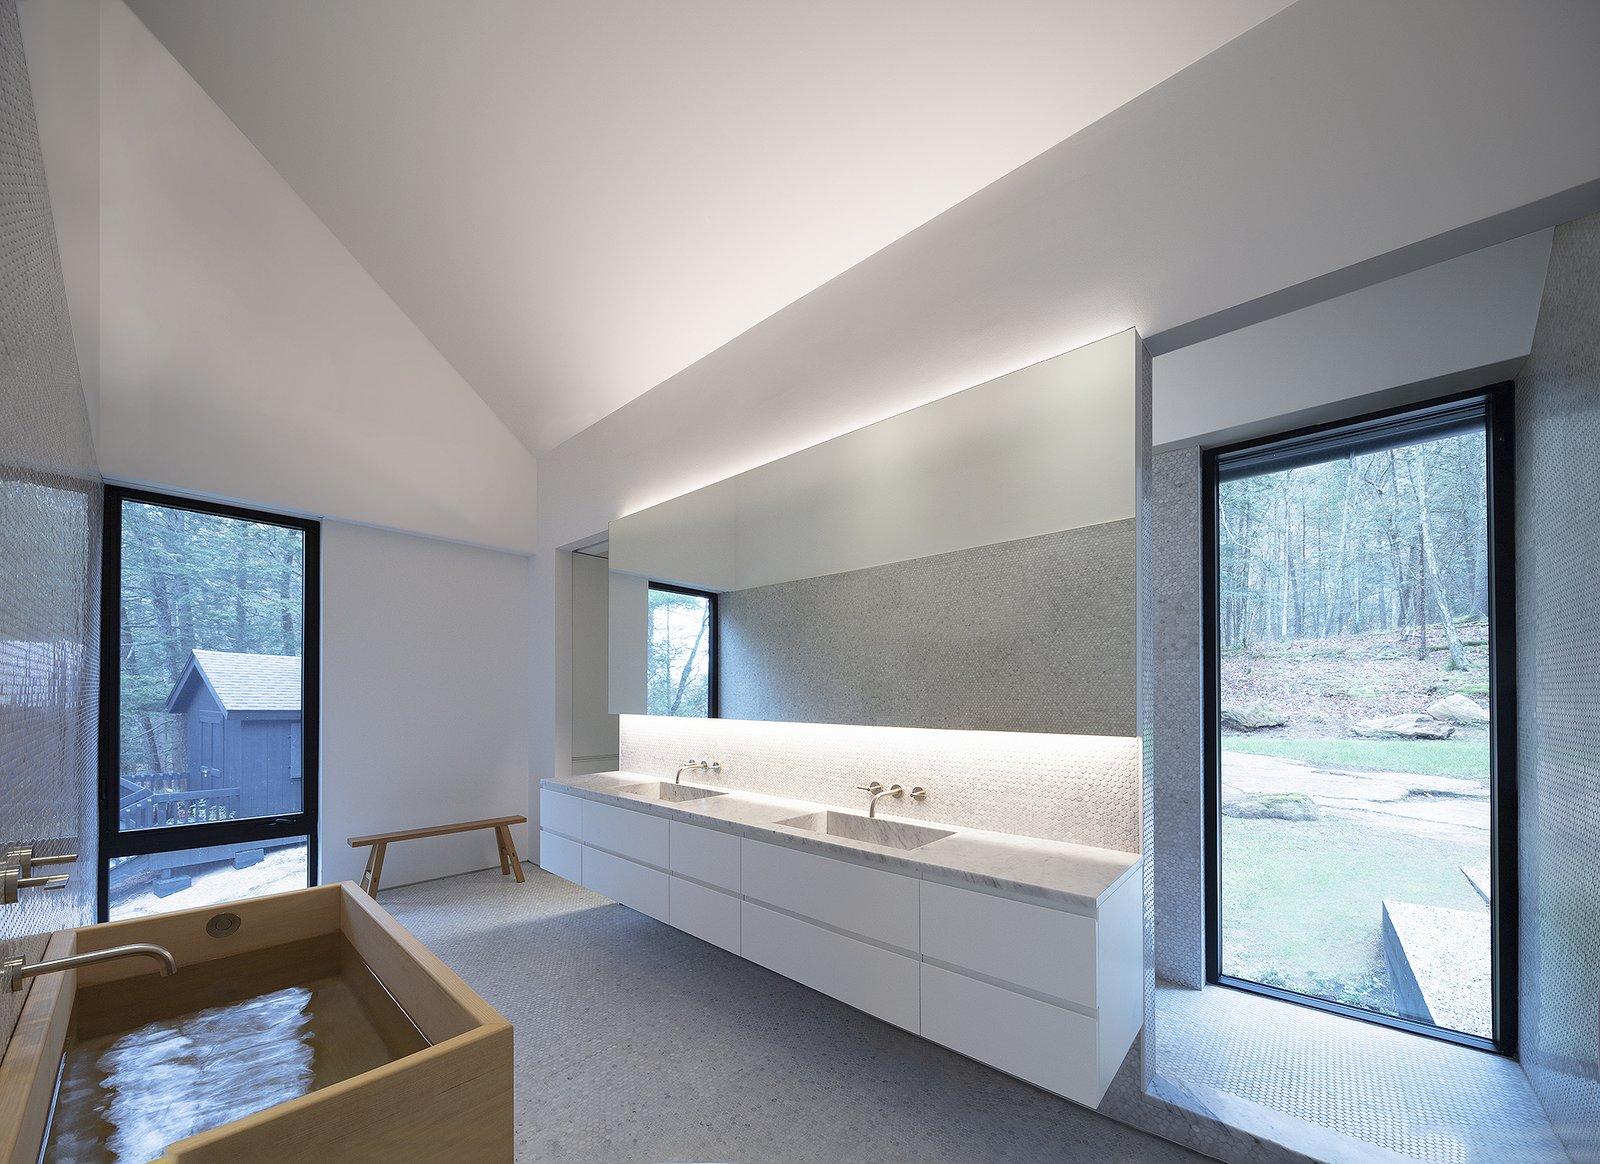 Ledge House by Desai Chia Architecture master bathroom